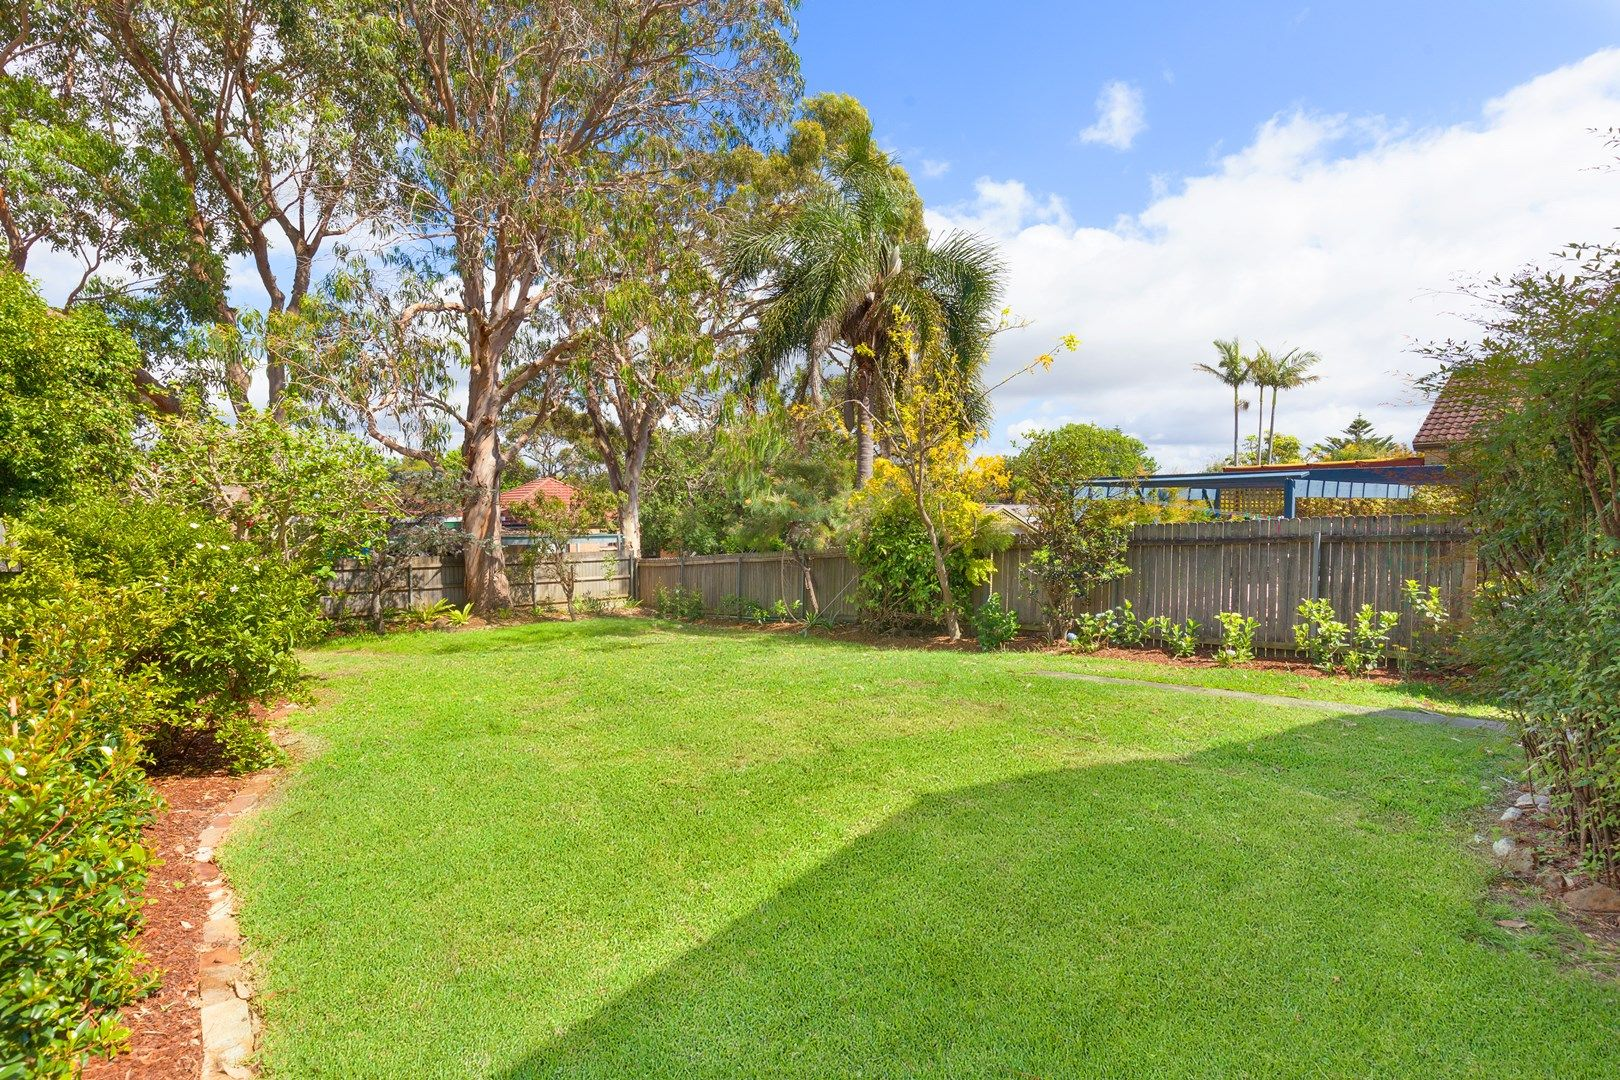 74 Fuller Street, Collaroy Plateau NSW 2097, Image 0